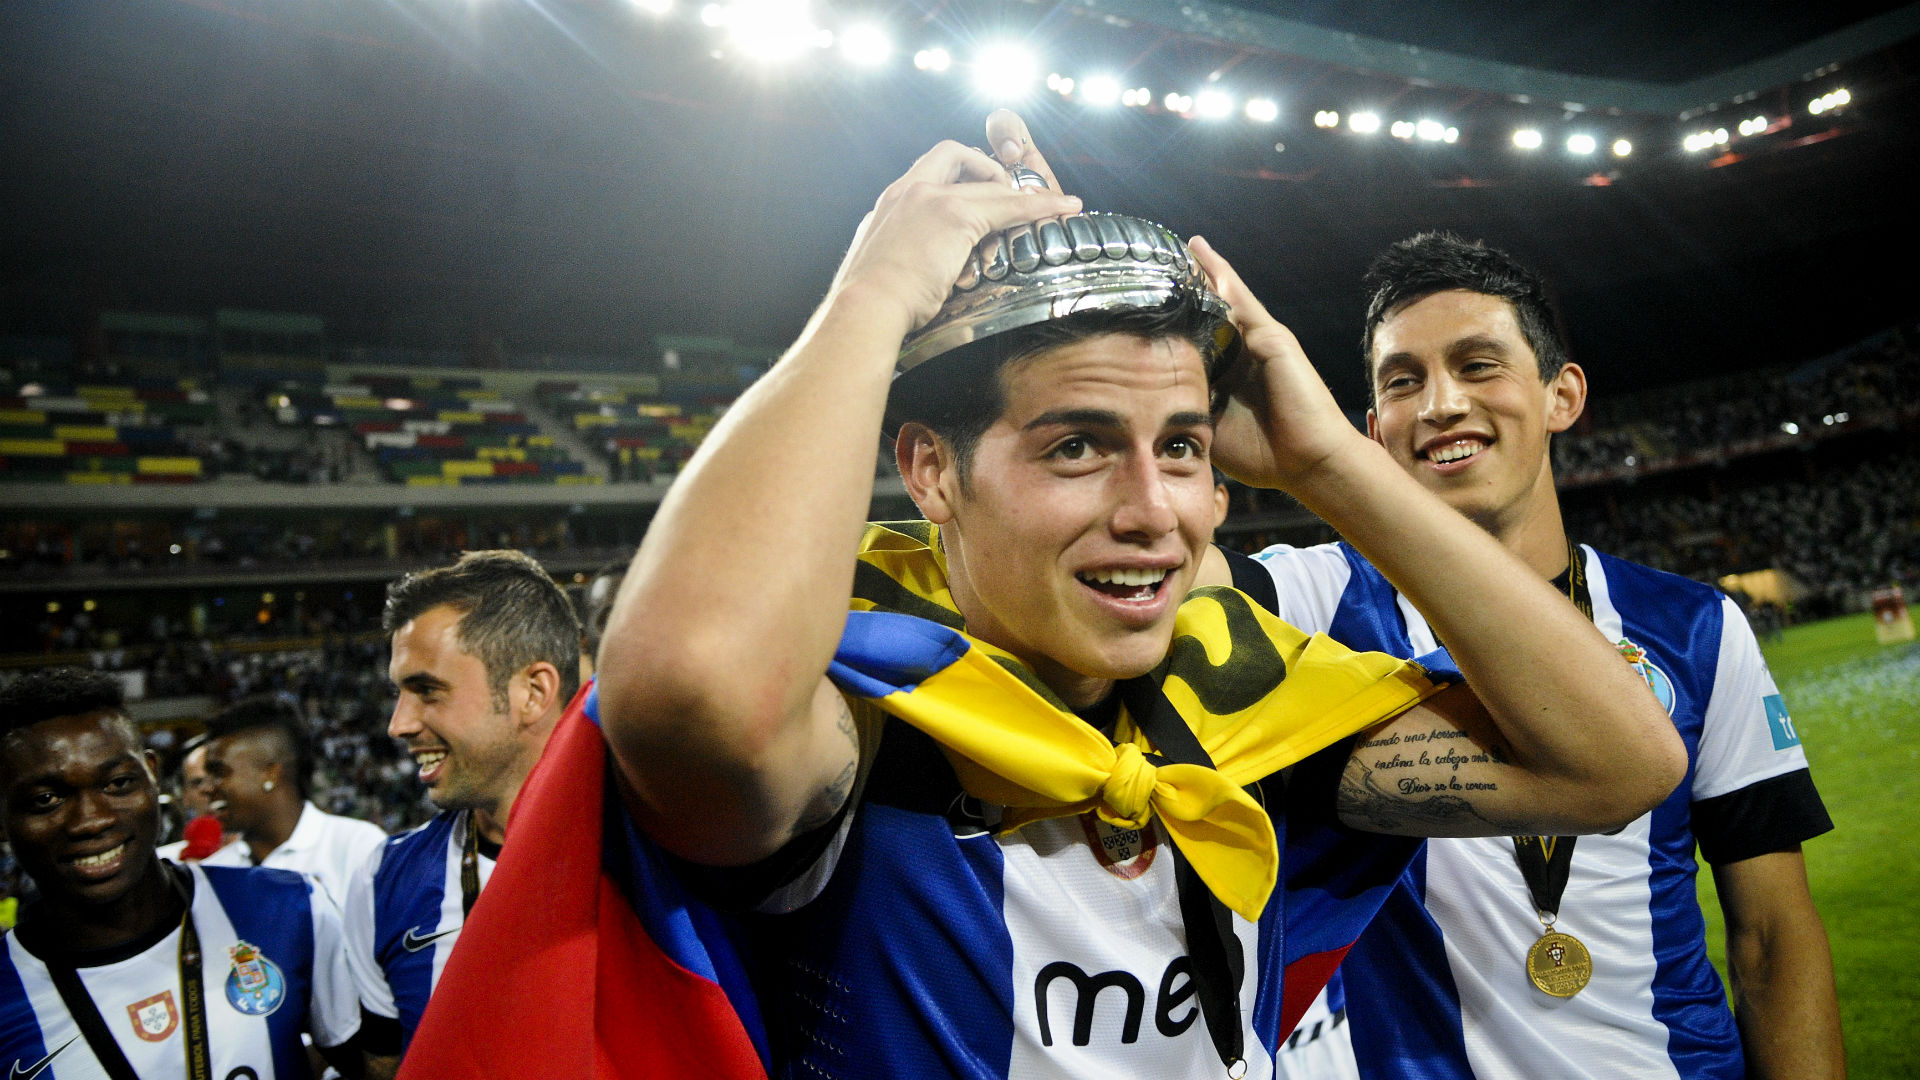 James campen Porto supercopa 2012